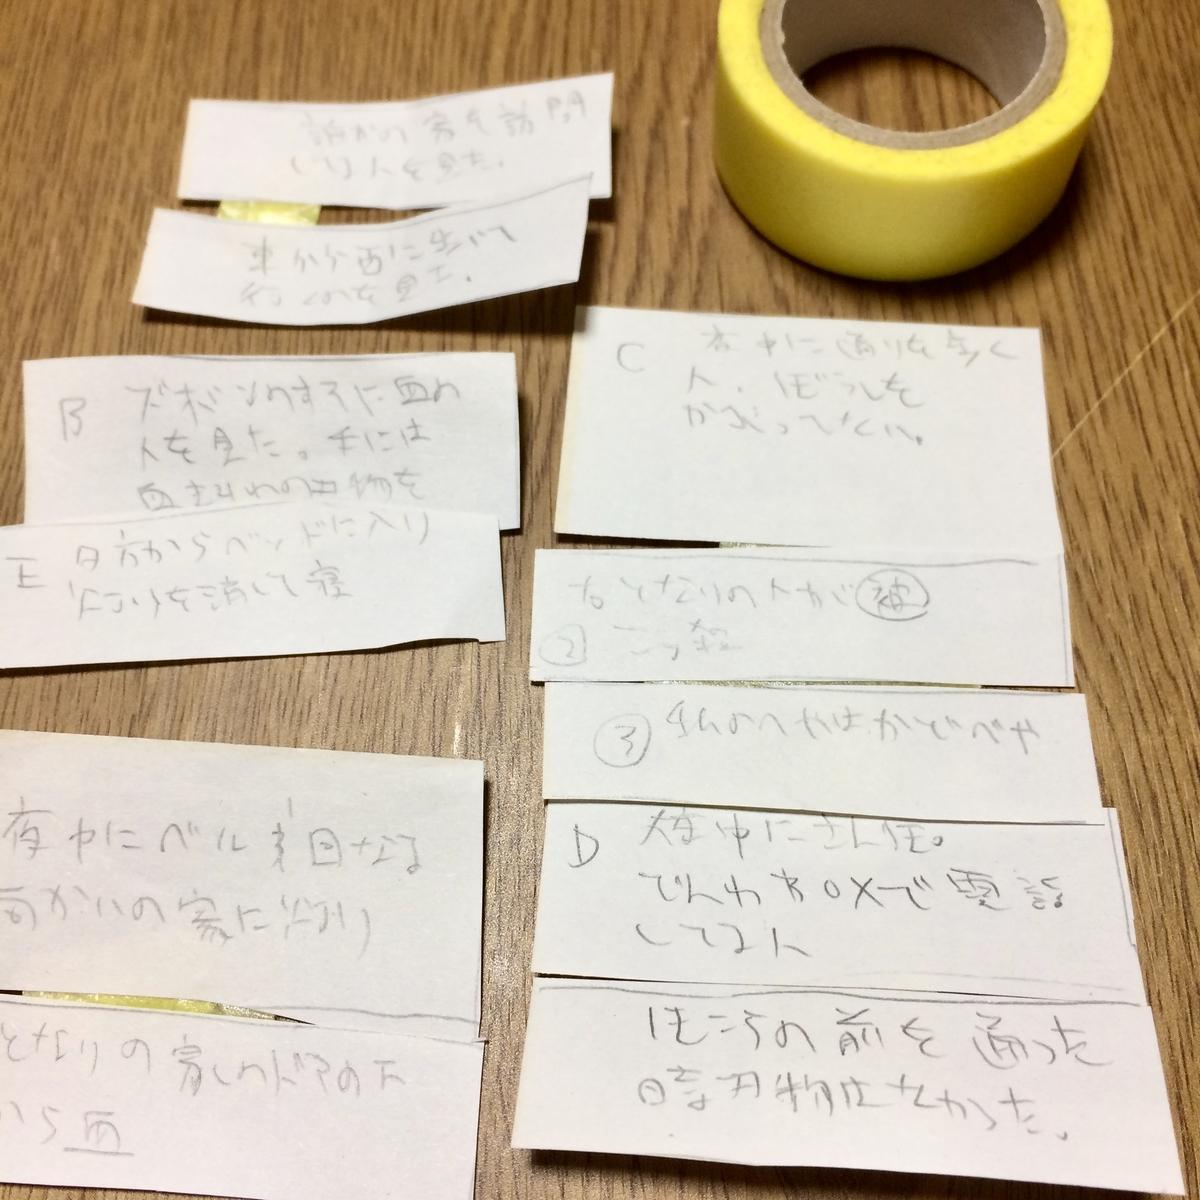 f:id:akumu-hinageshi:20190423233211j:plain